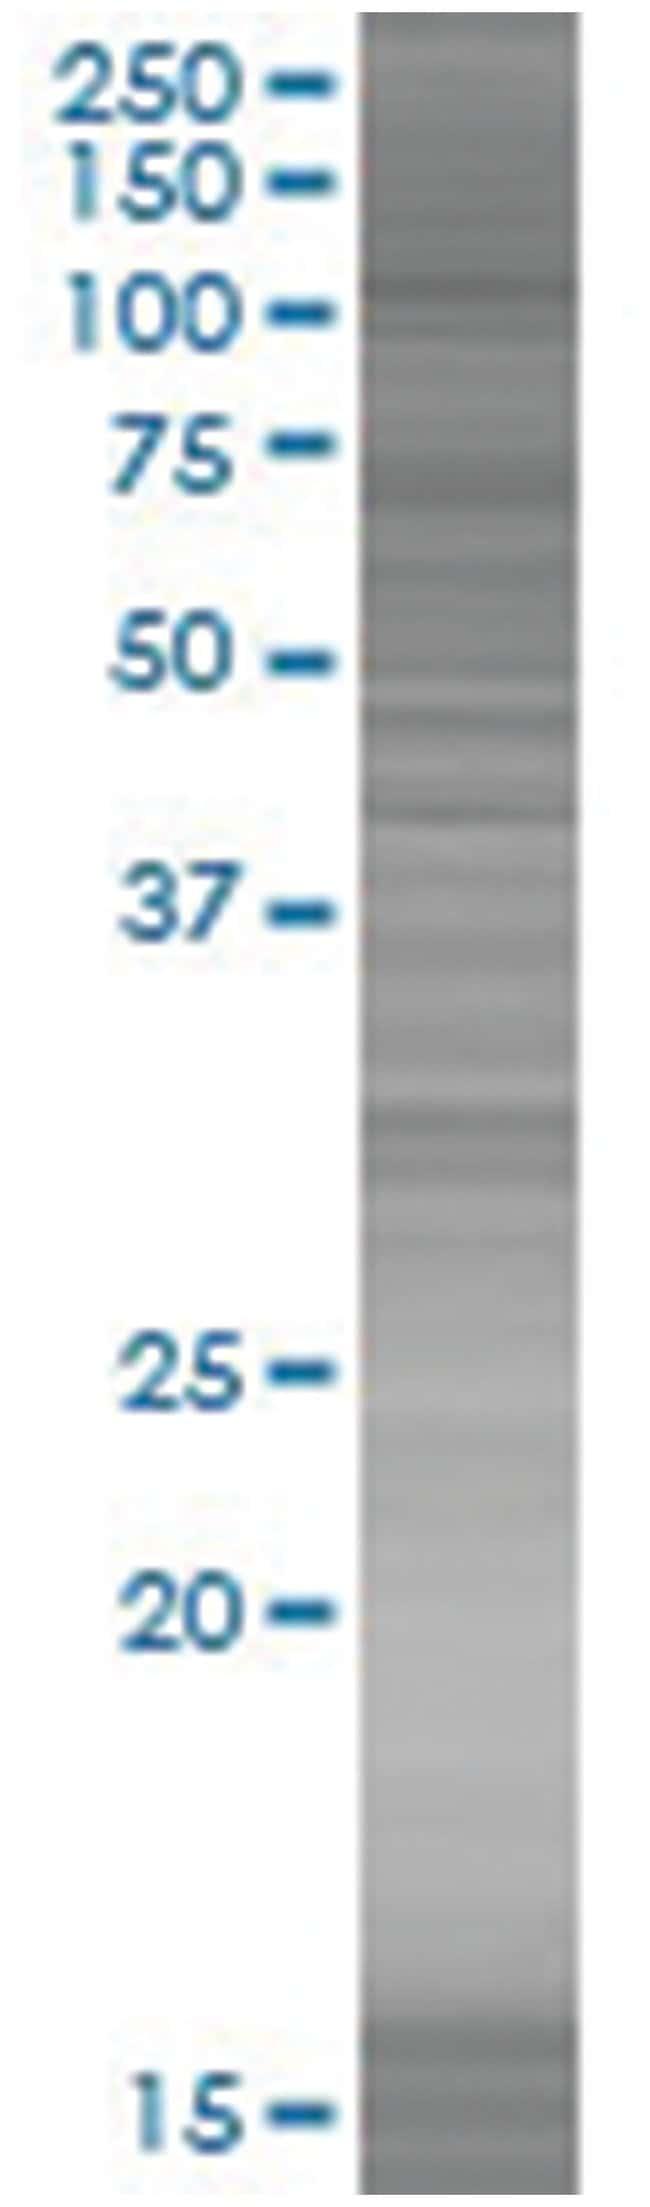 MSH2 293T Cell Overexpression Lysate (Denatured), Abnova 100µL:Life